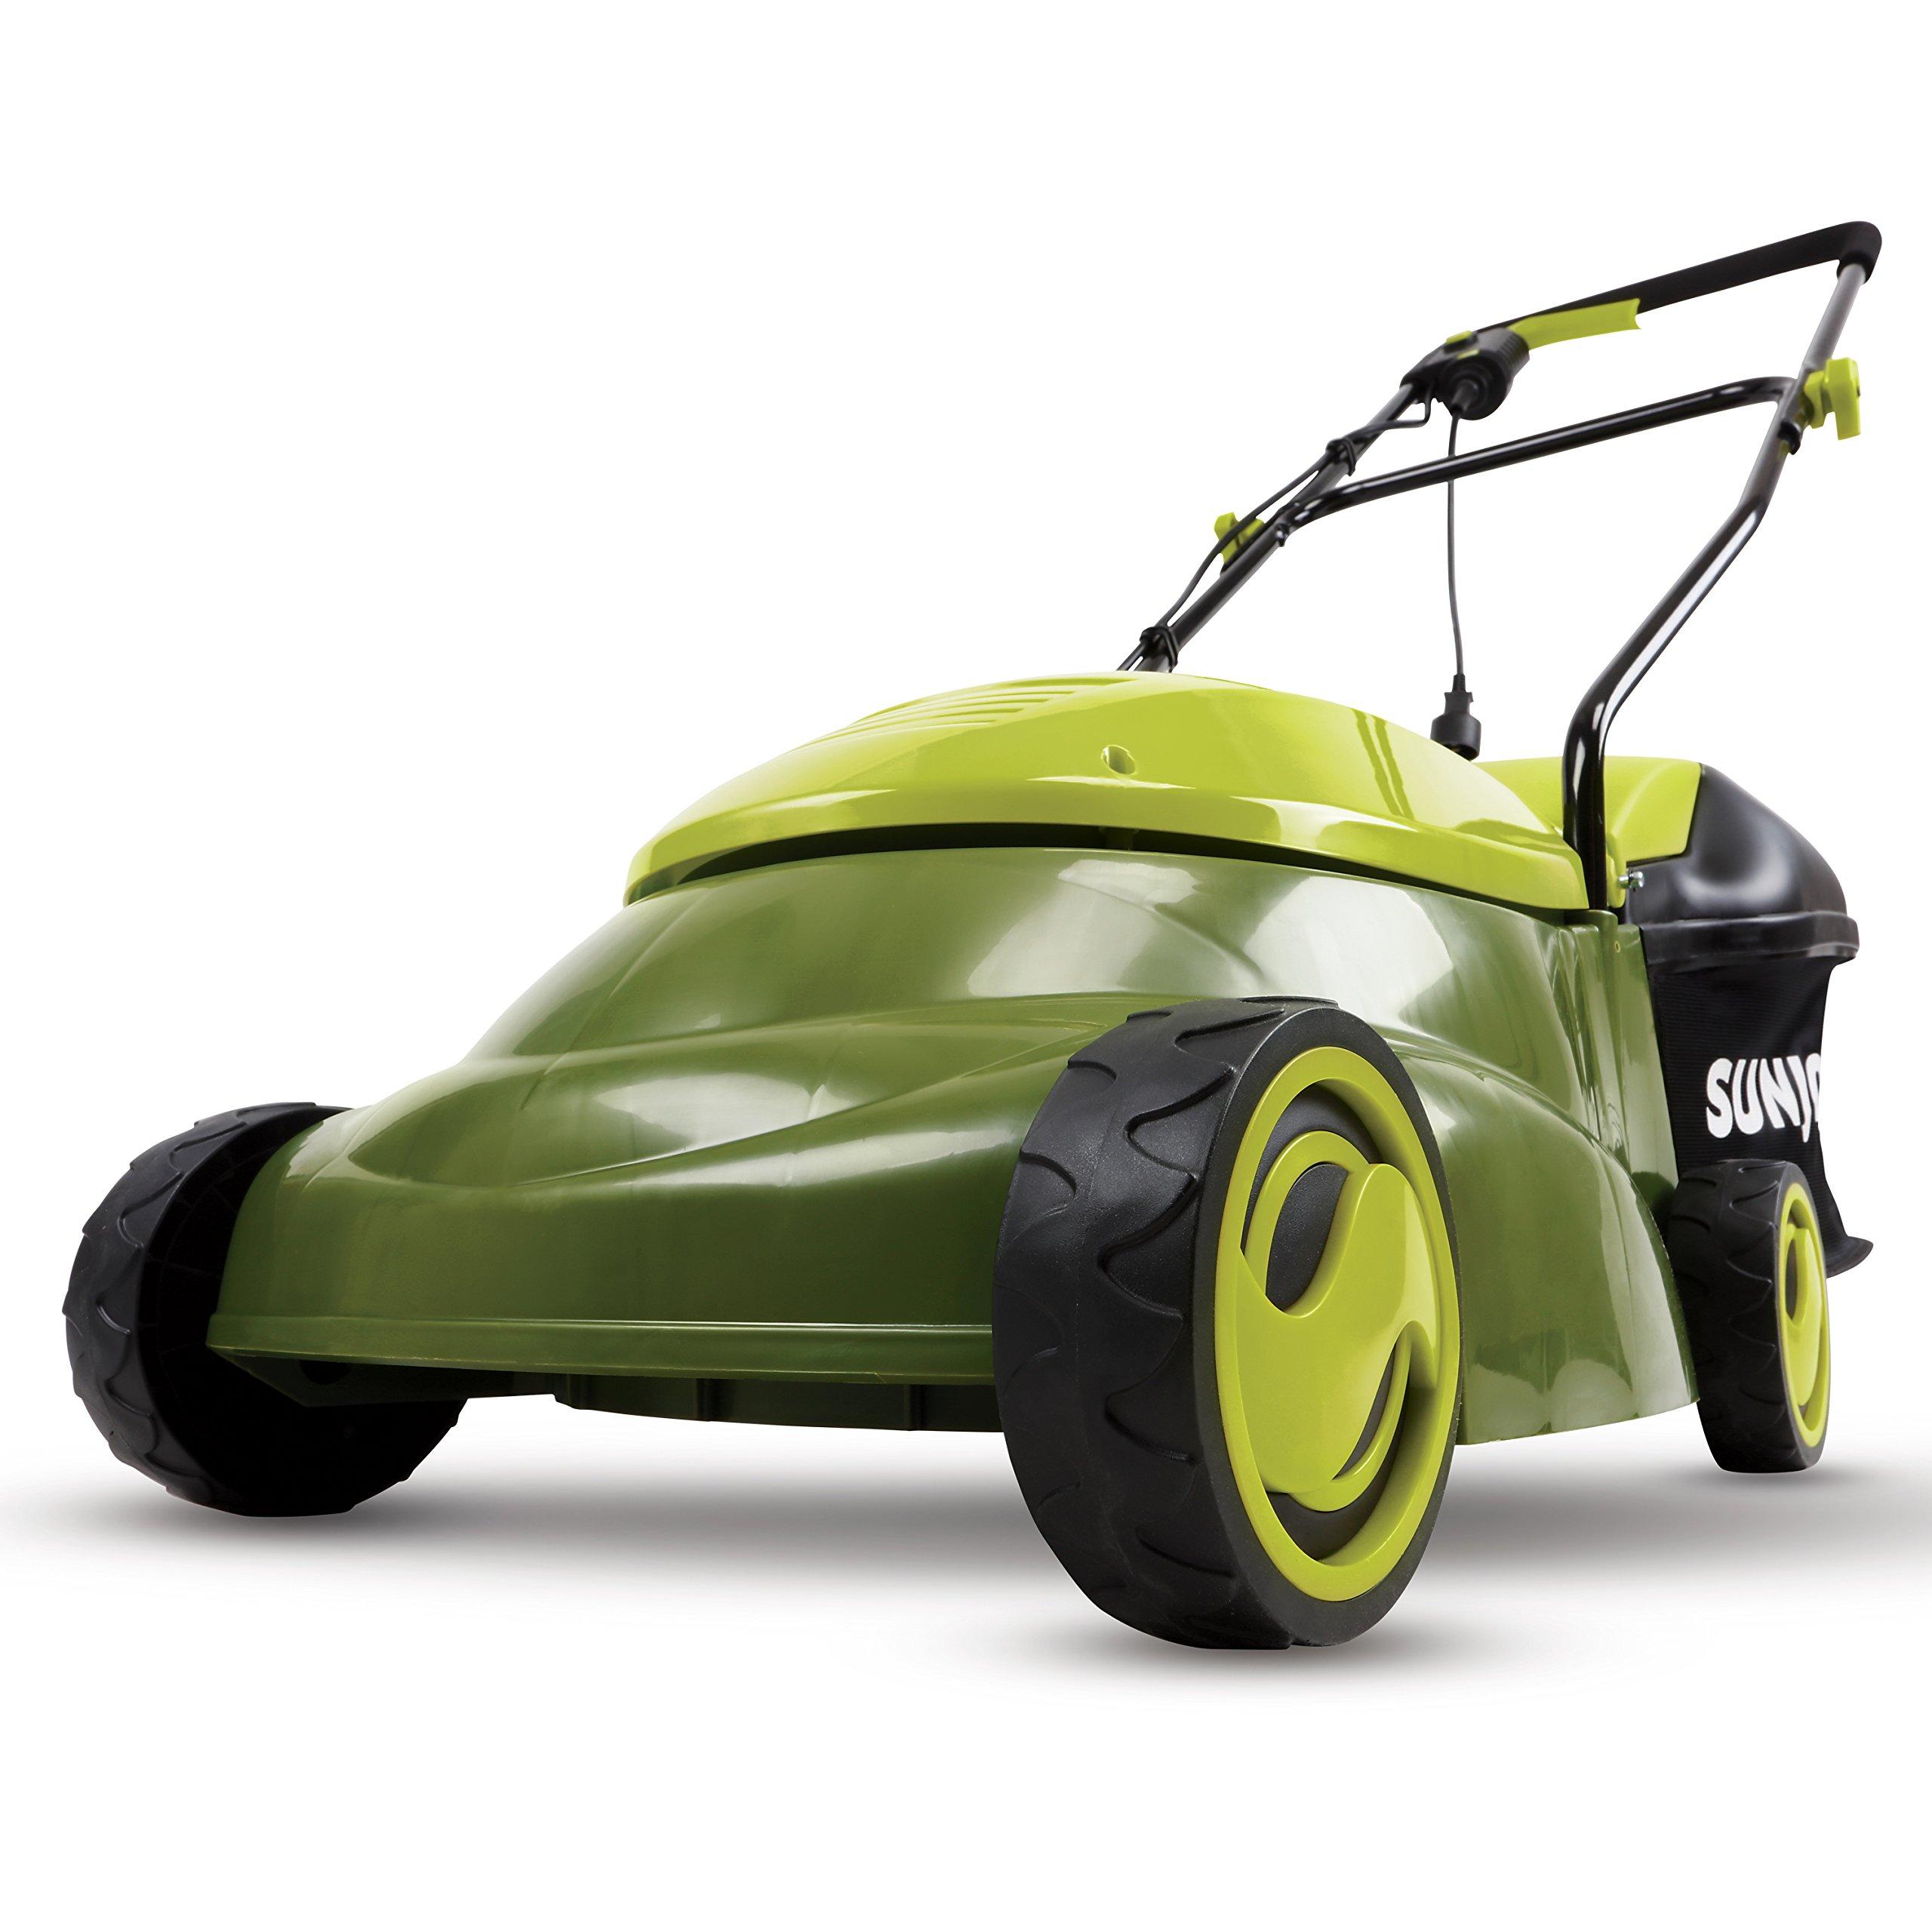 Sun Joe MJ401E-PRO 14 inch 13 Amp Electric Lawn Mower w/Side Discharge Chute, 14''